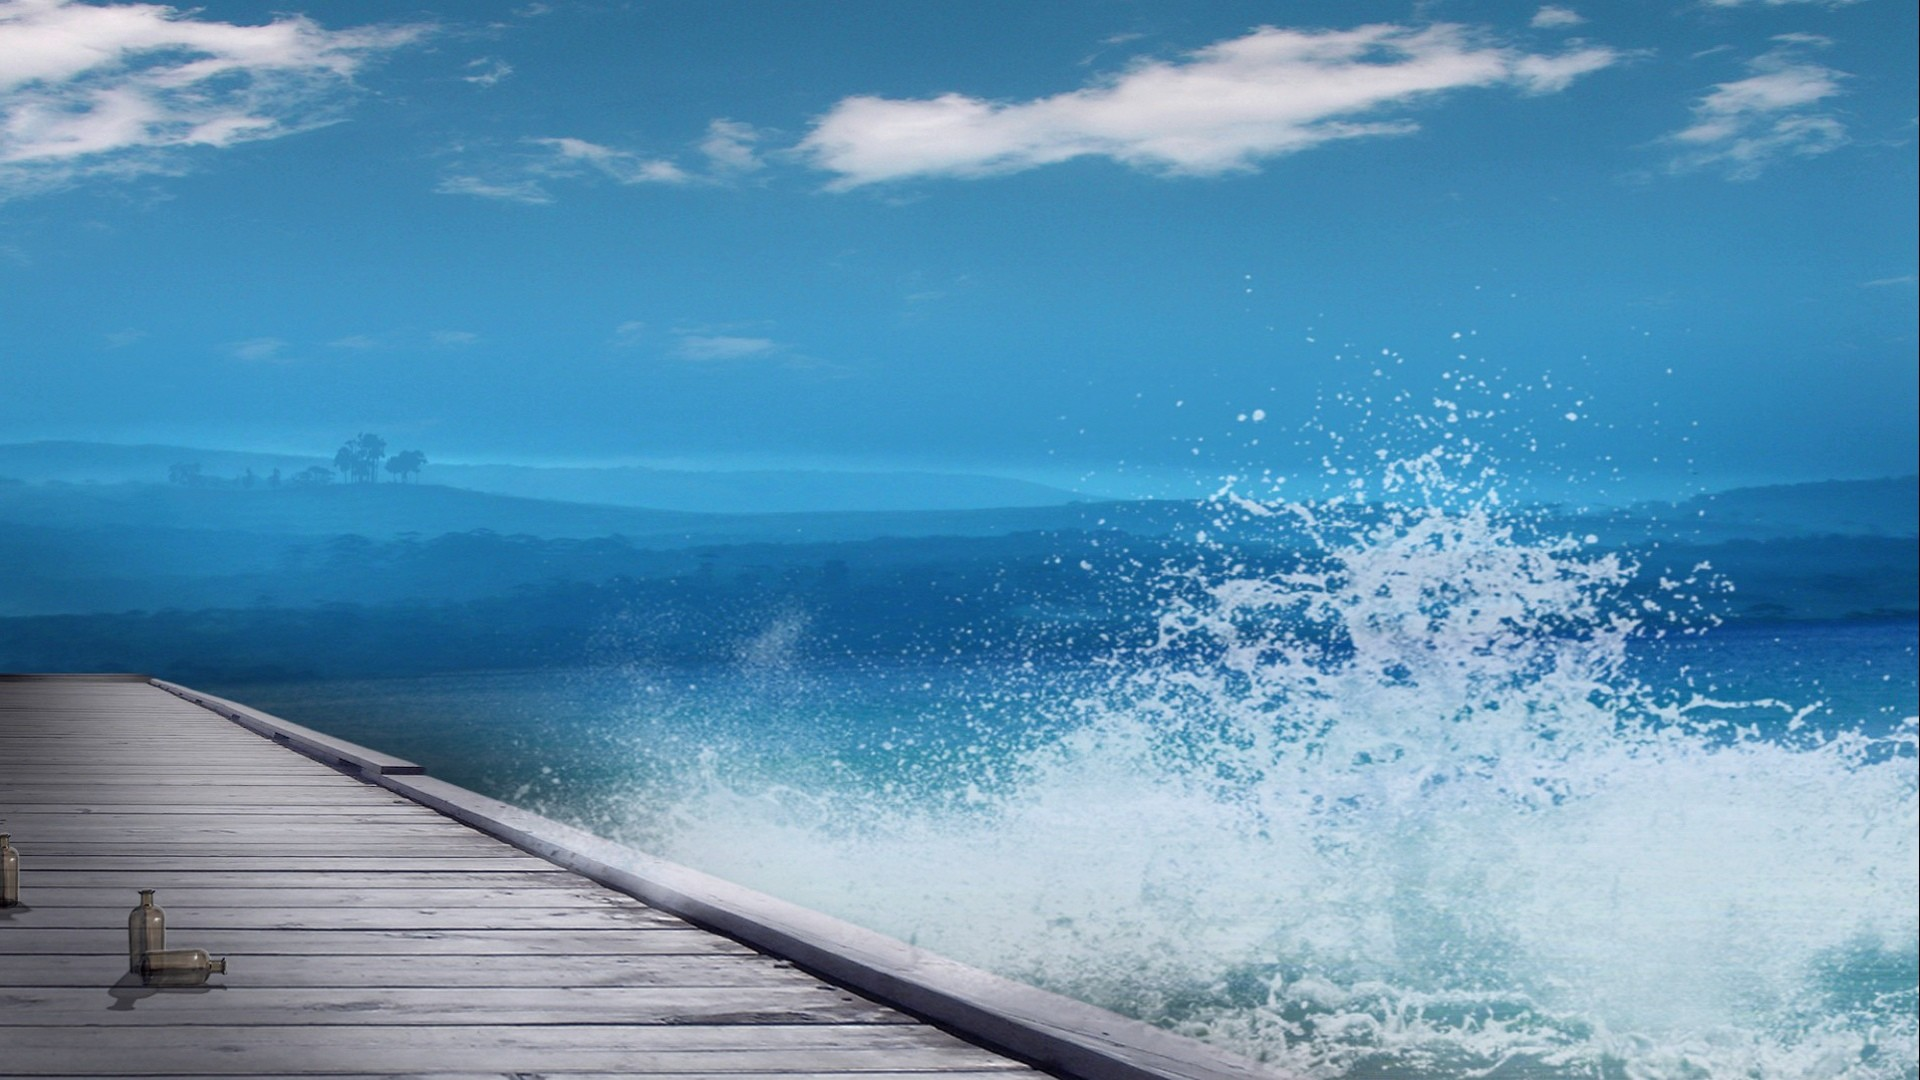 download best hd desktop wallpapers widescreen wallpapers for free in